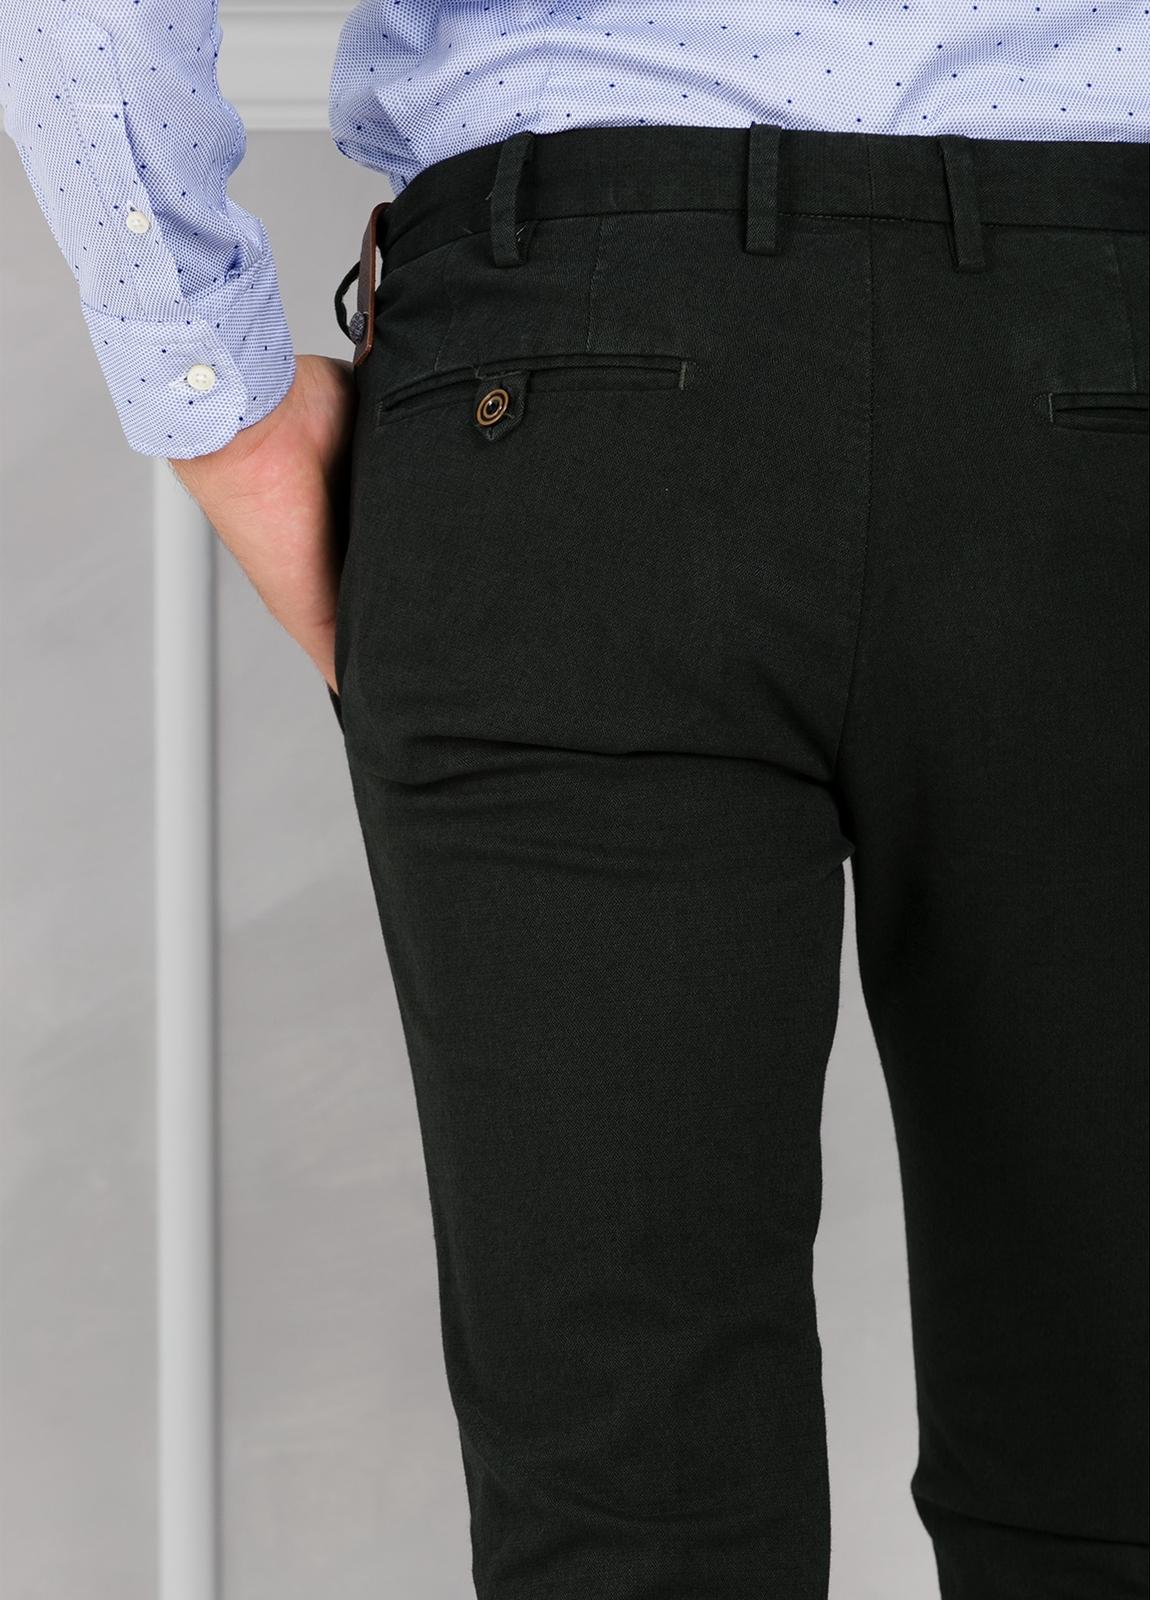 Pantalón chino ligeramente slim fit modelo JACK color verde. 98% Algodón 2% Elastán. - Ítem3